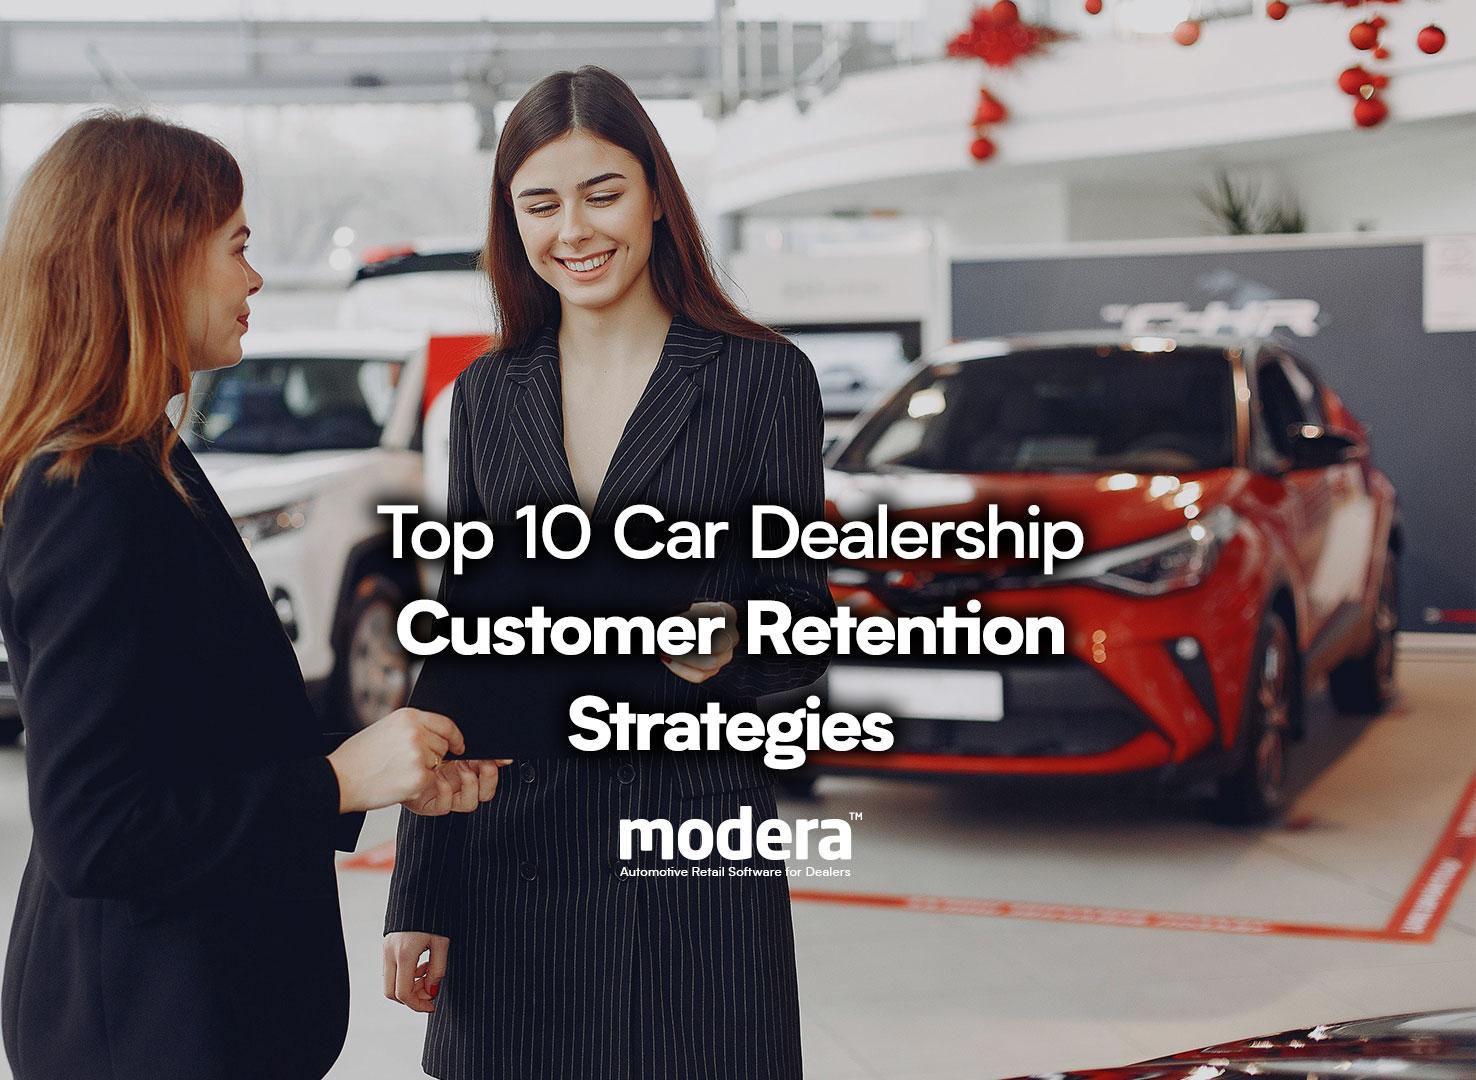 dealership customer retention strategies